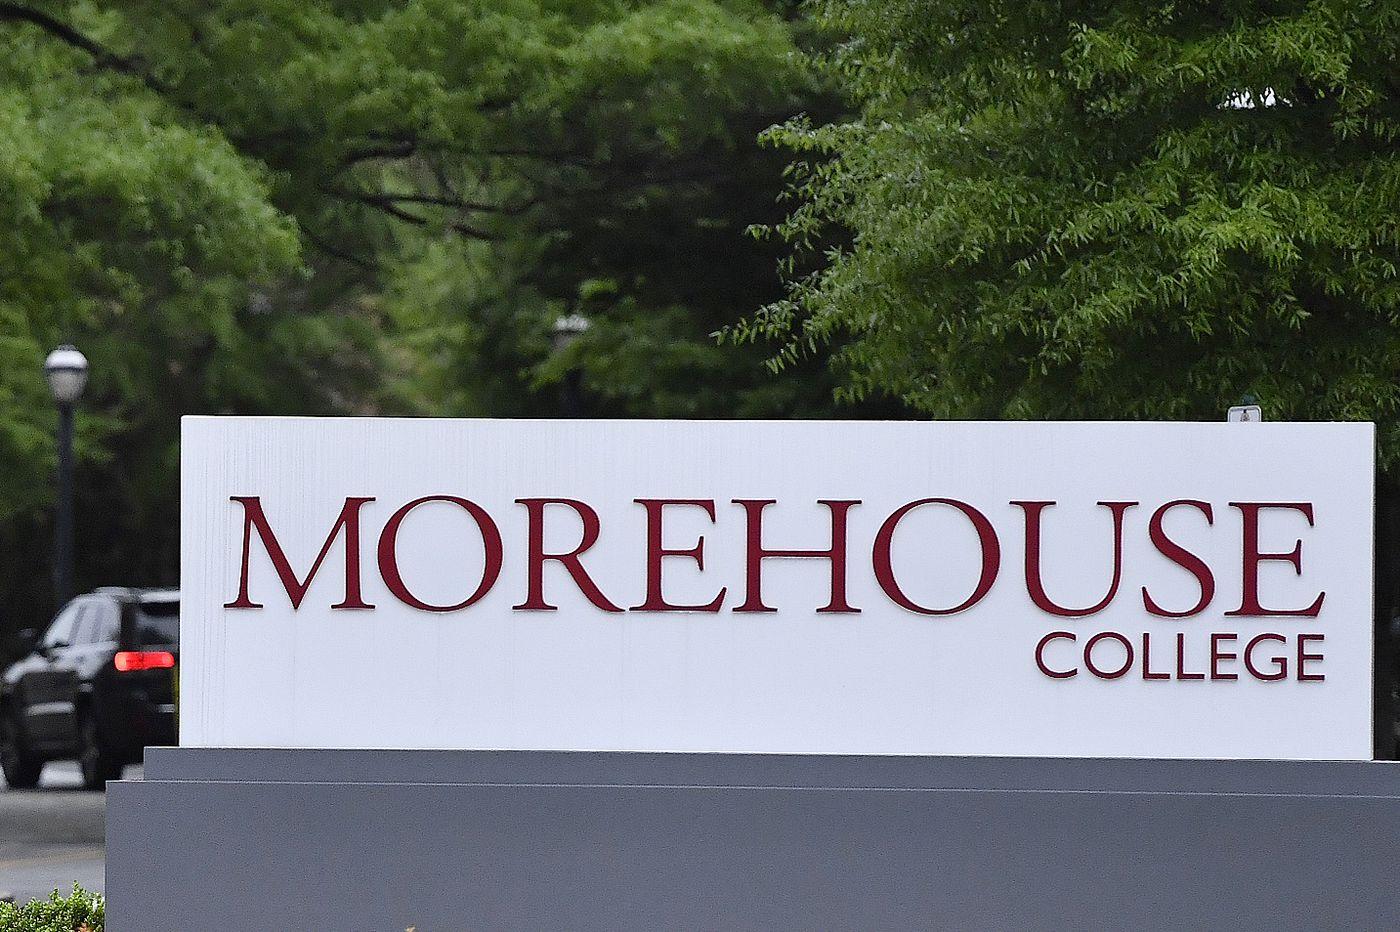 Billionaire graduation speaker pledges to pay Morehouse's class of 2019 student debt